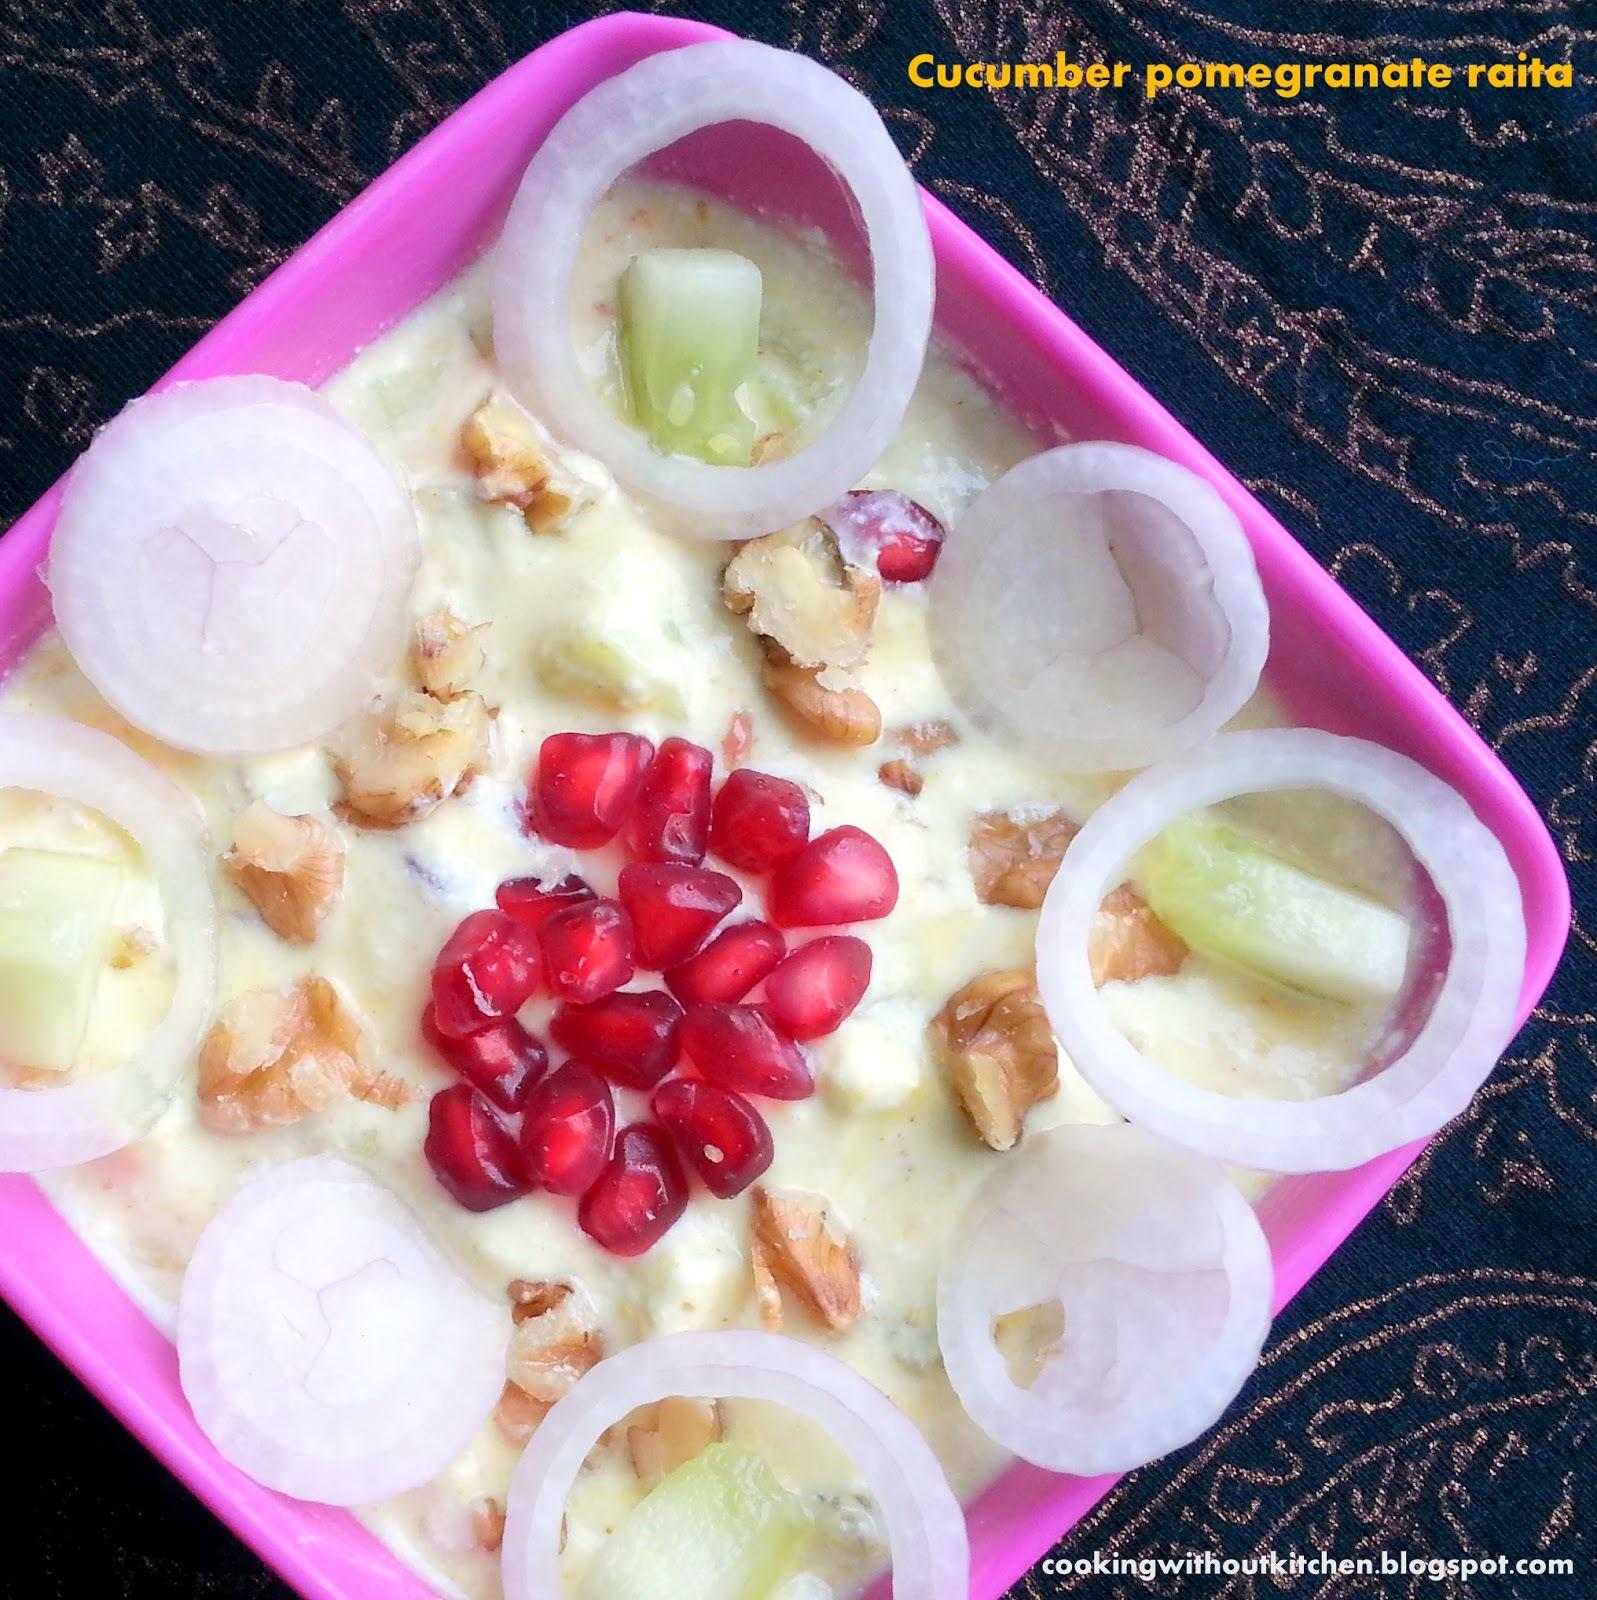 Cucumber pomegranate in yoghurt dressing (Anar aur kheere ka raita)